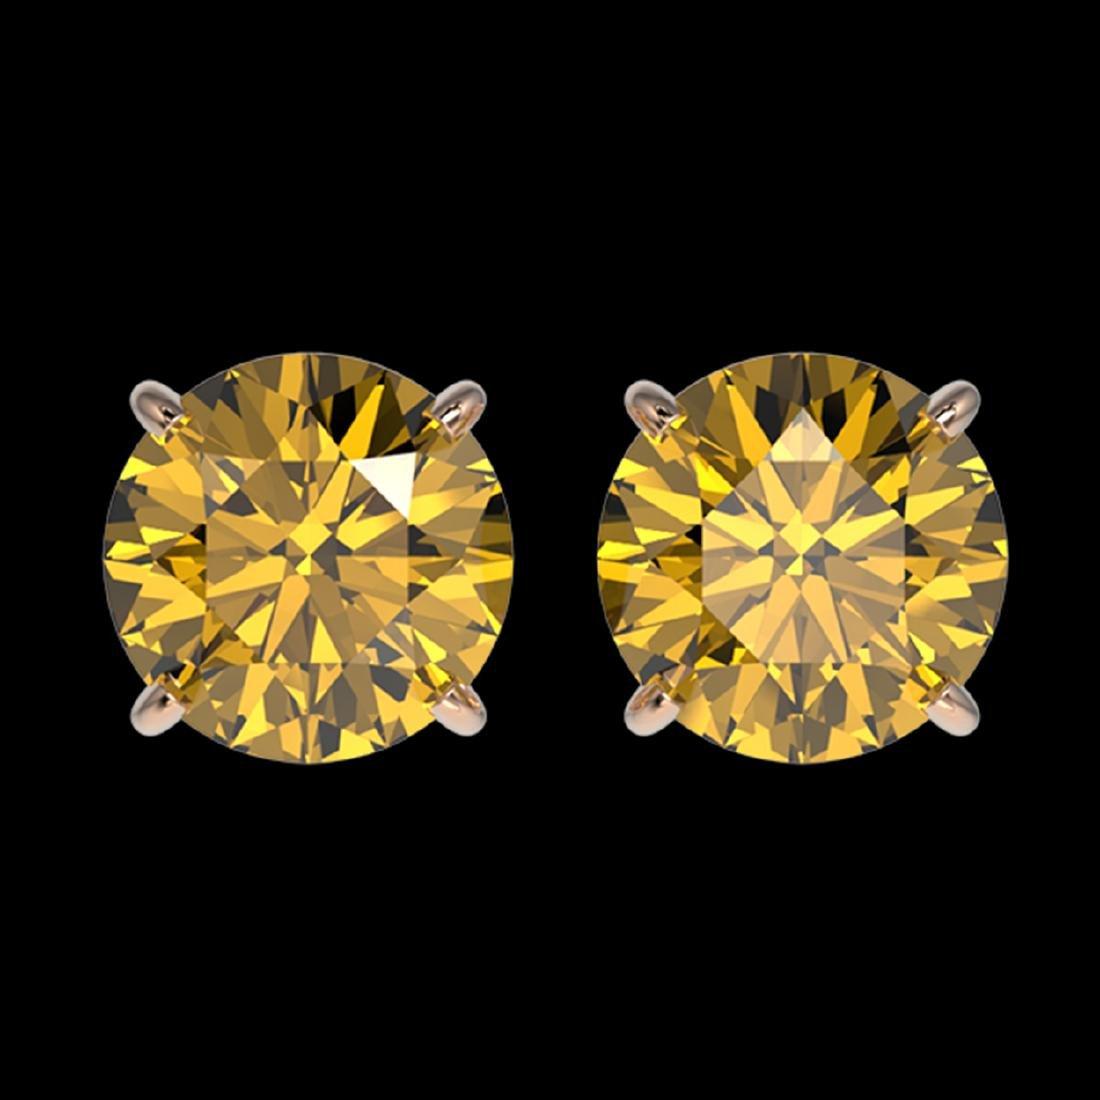 2.11 ctw Intense Yellow Diamond Stud Earrings 10K Rose